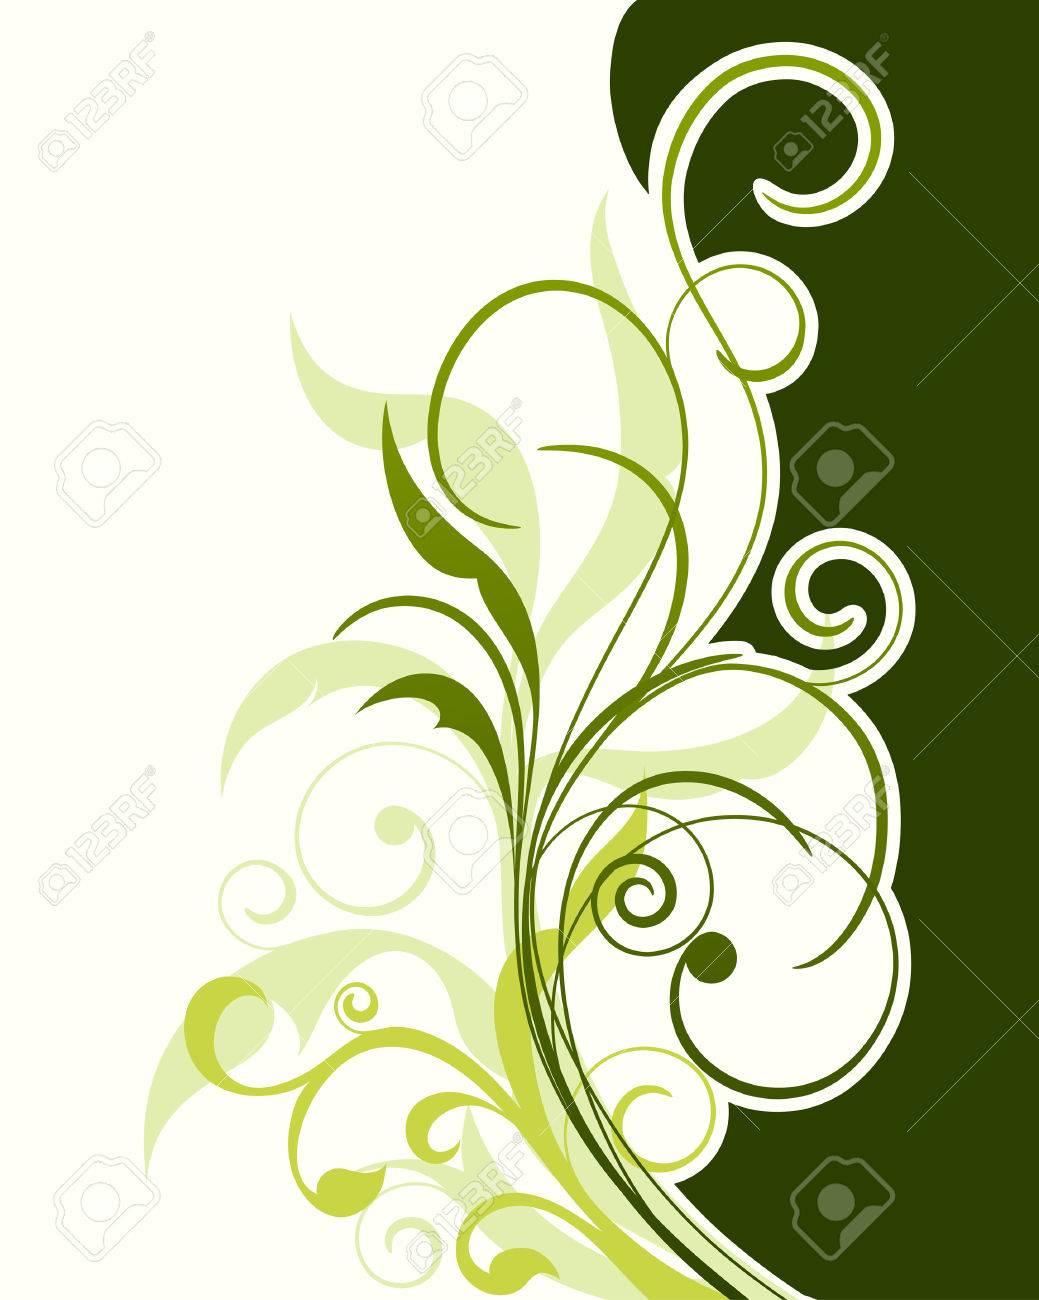 Floral background for design use. Vector illustration. Stock Vector - 5508511